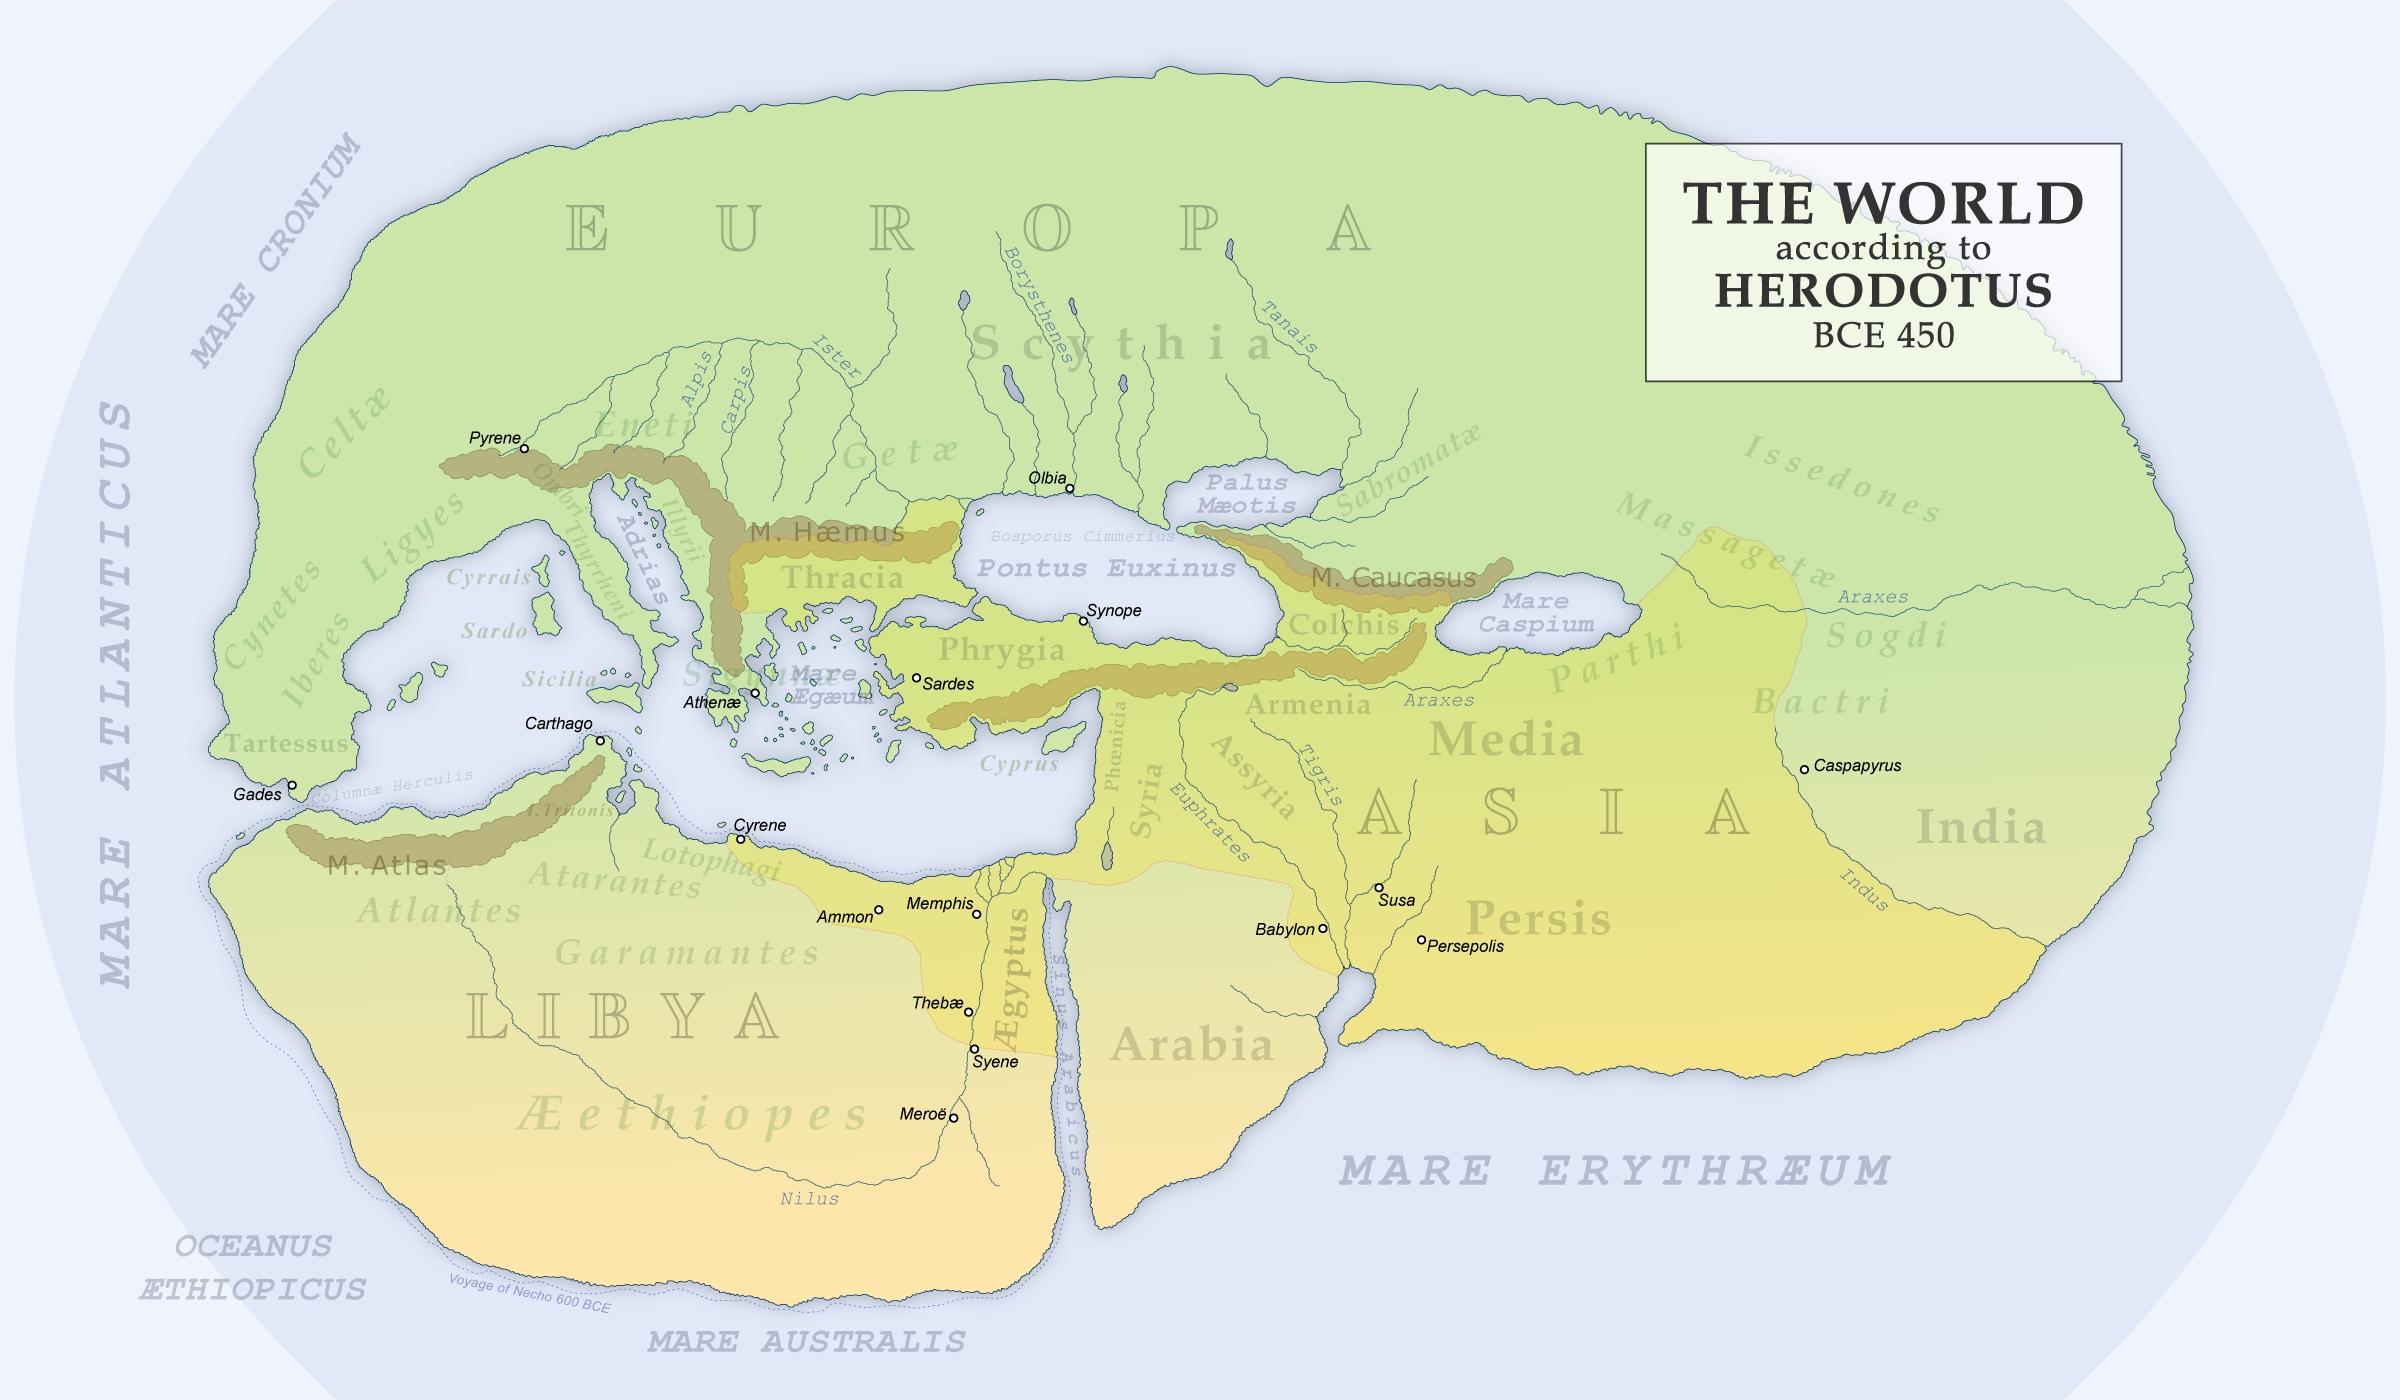 Dragonsfoot view topic need a quick world map httpuploadmediawikipediac ldmapg gumiabroncs Images